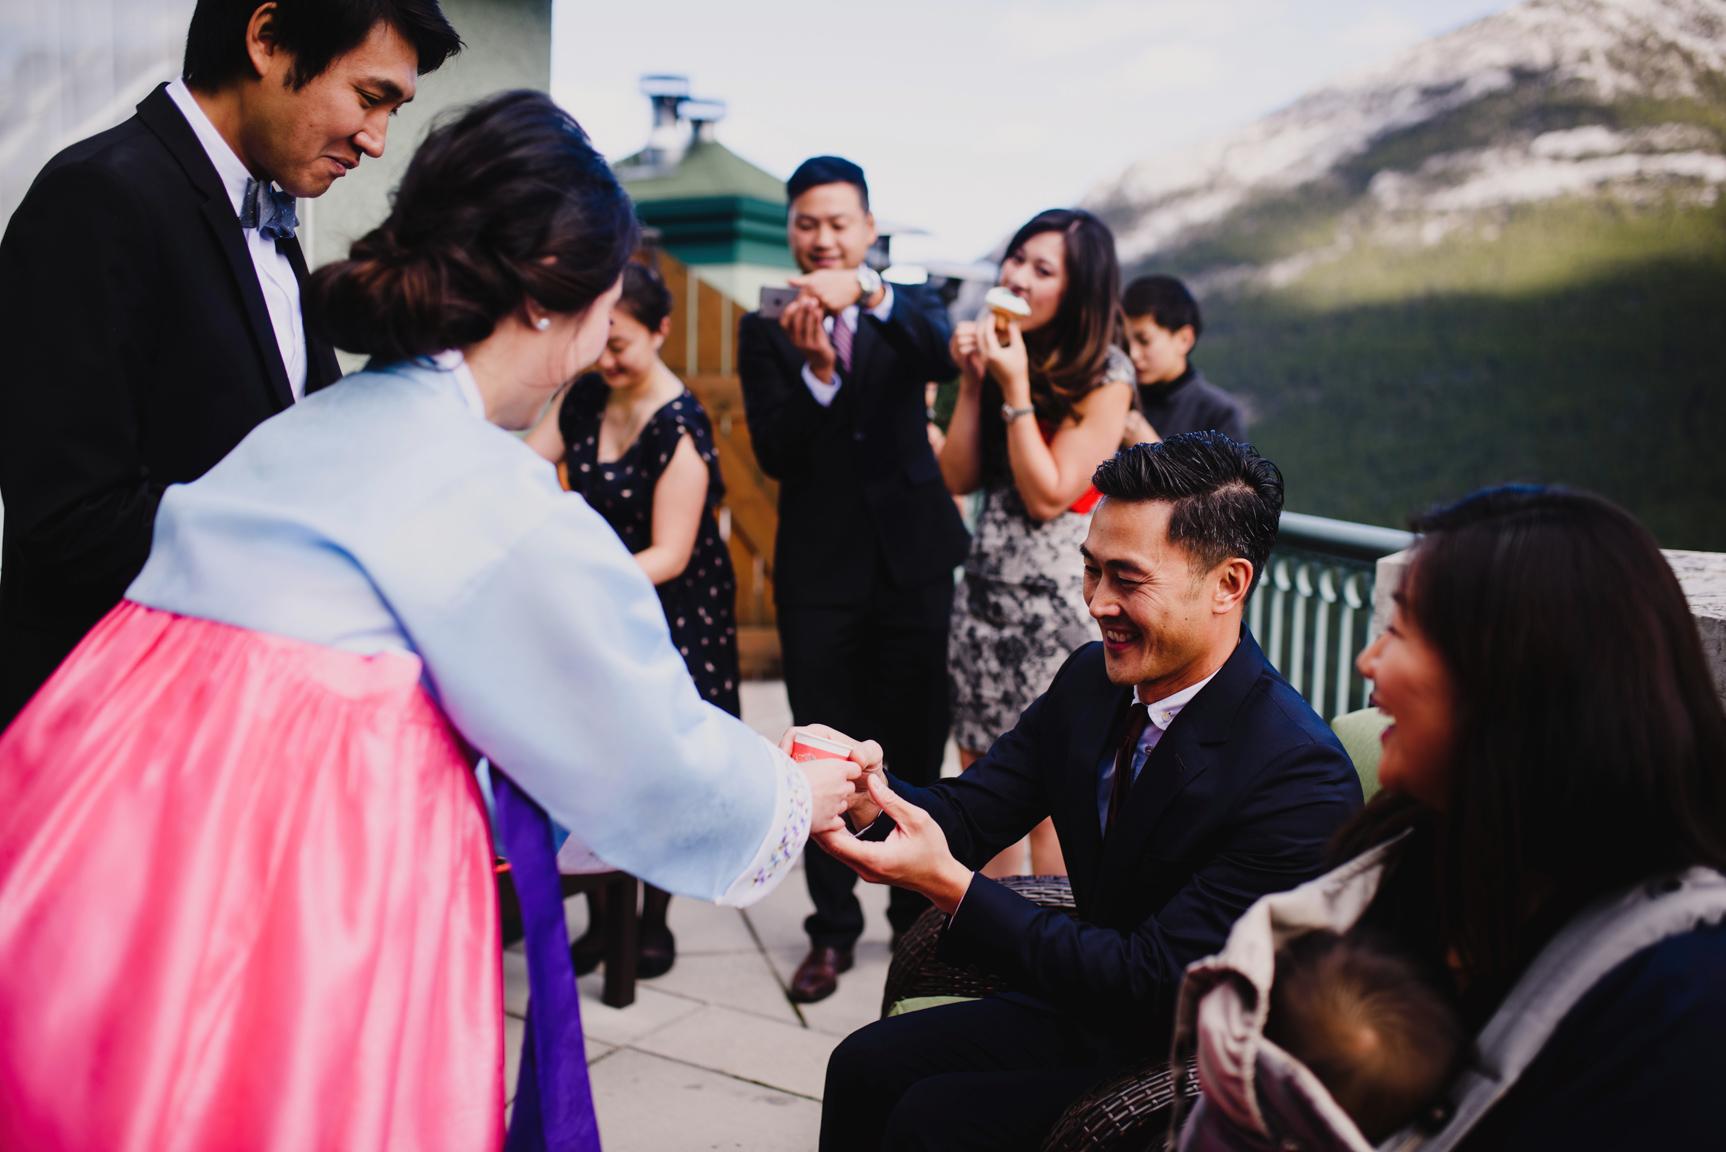 Banff-Wedding-Photography-MichaelChanPhotography23.JPG